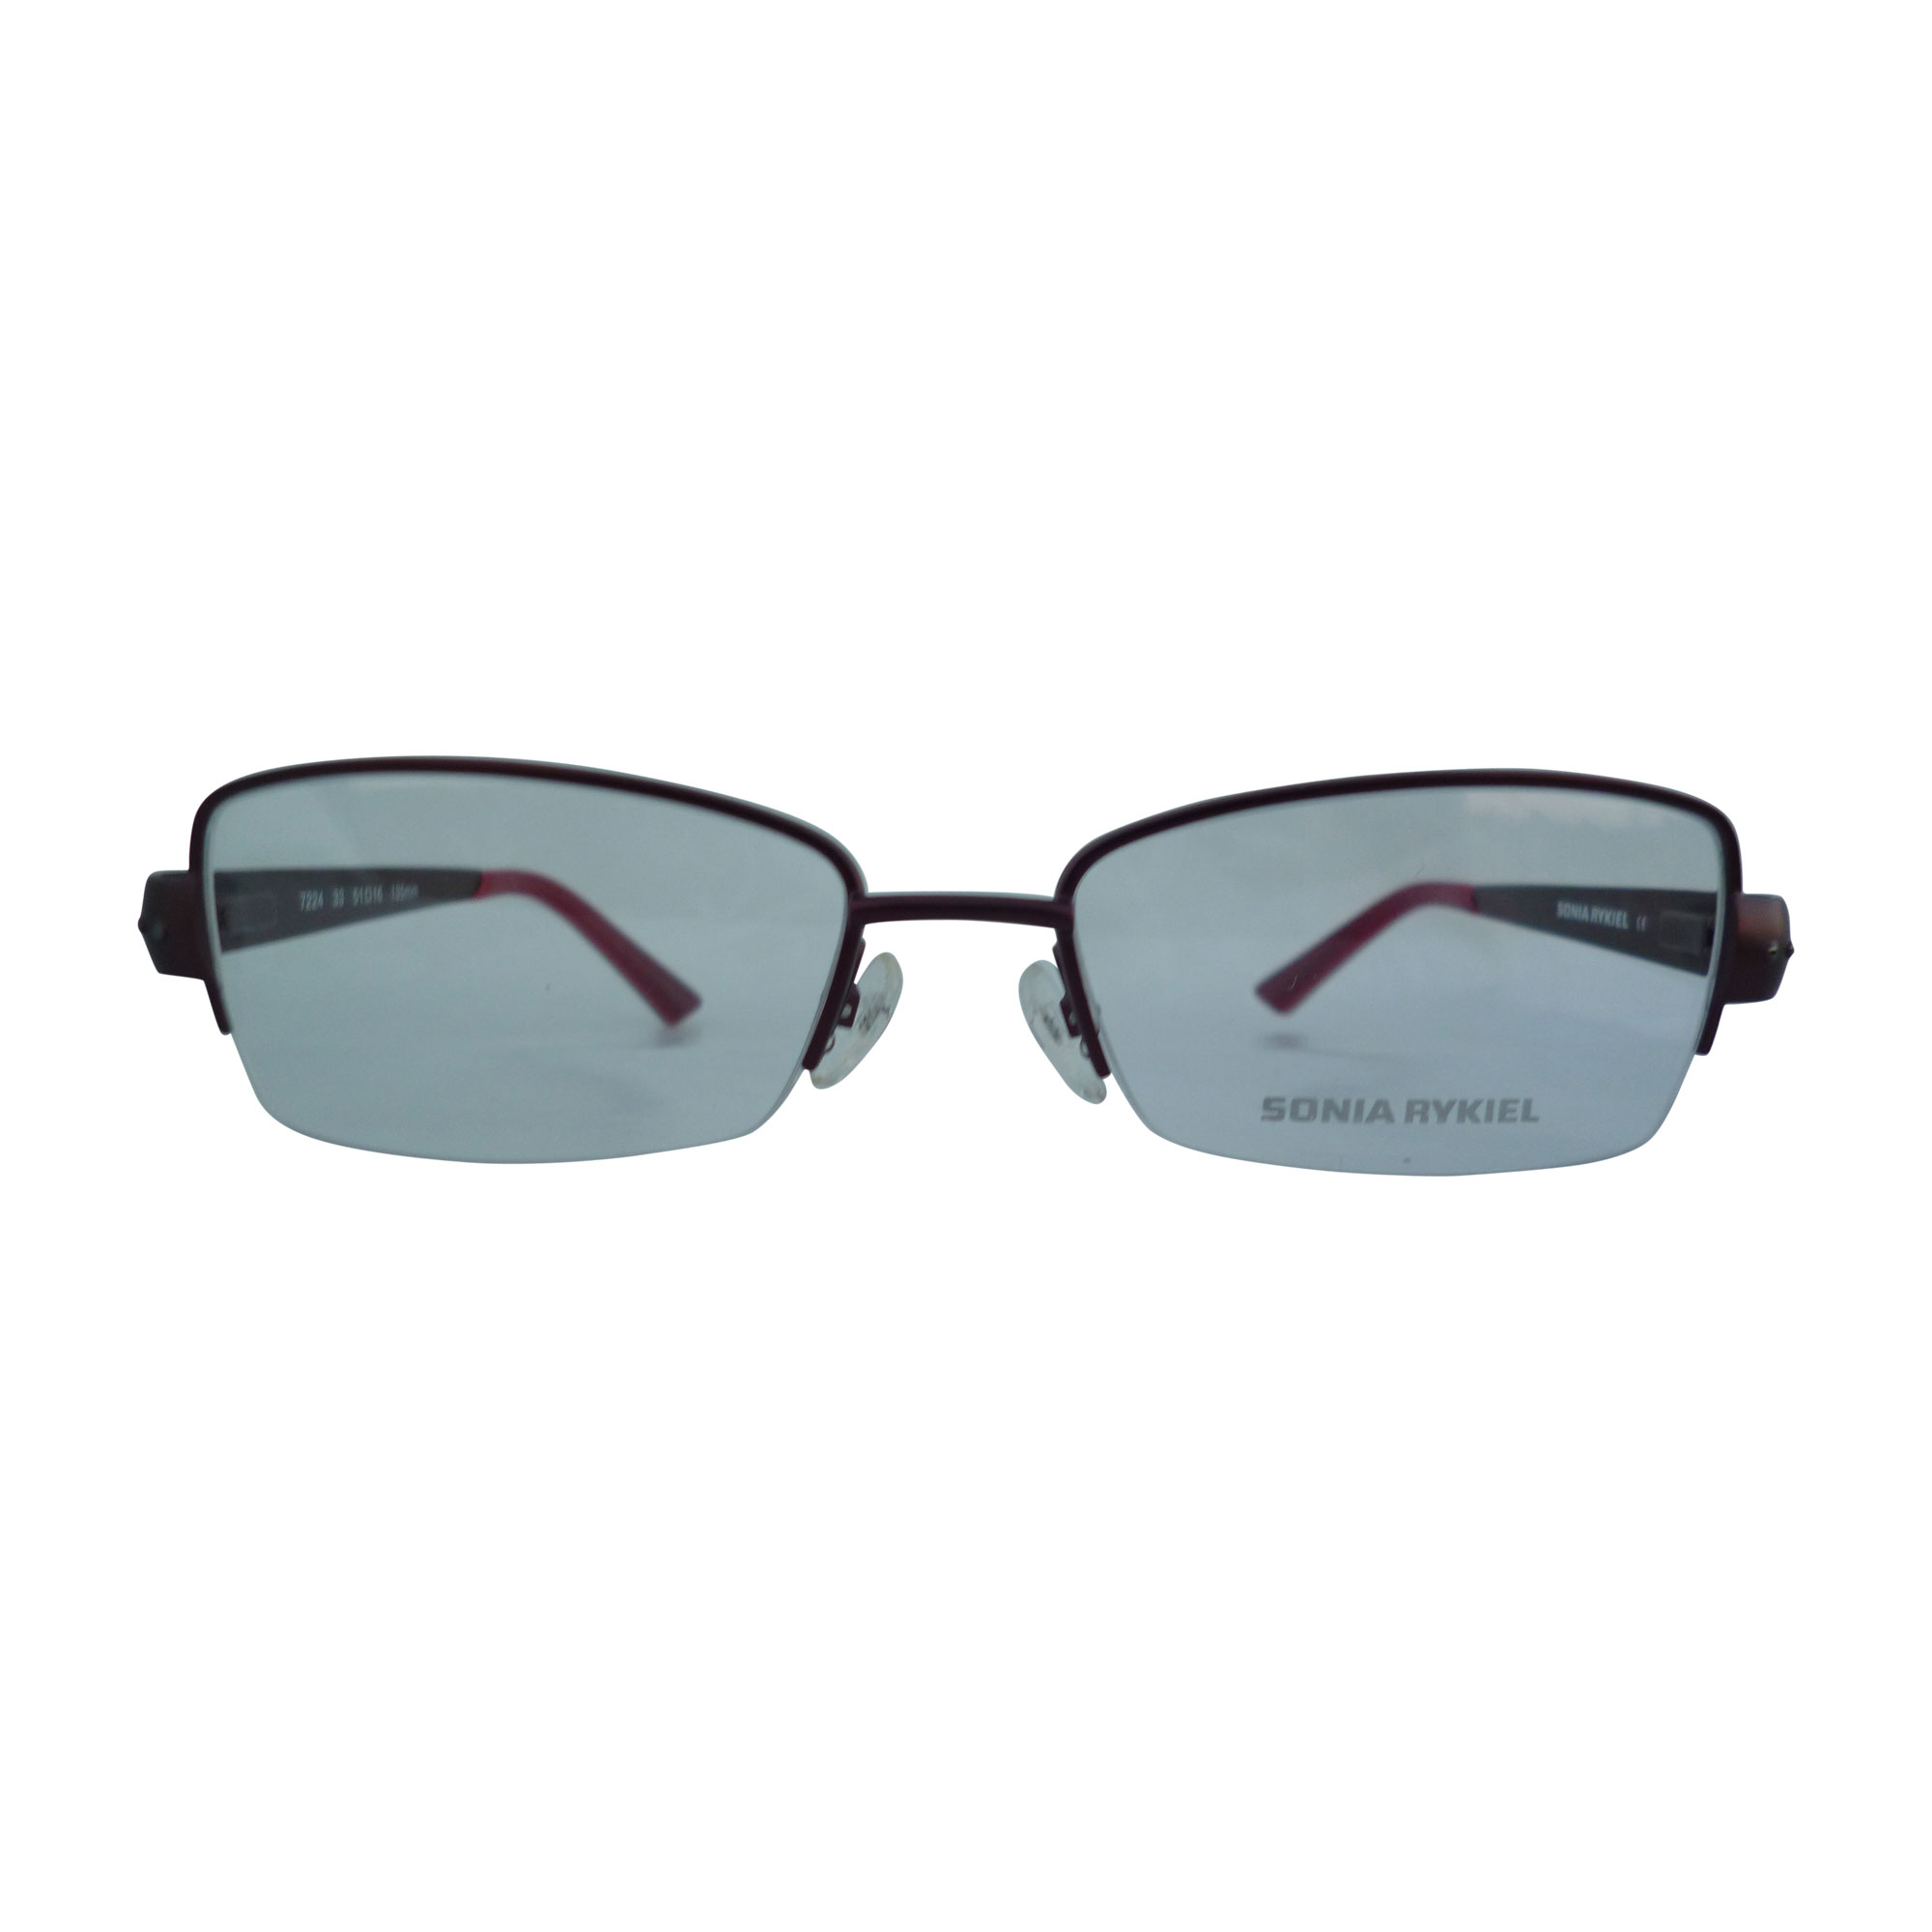 Monture de lunettes SONIA RYKIEL Rose, fuschia, vieux rose 3716e1f85bd0